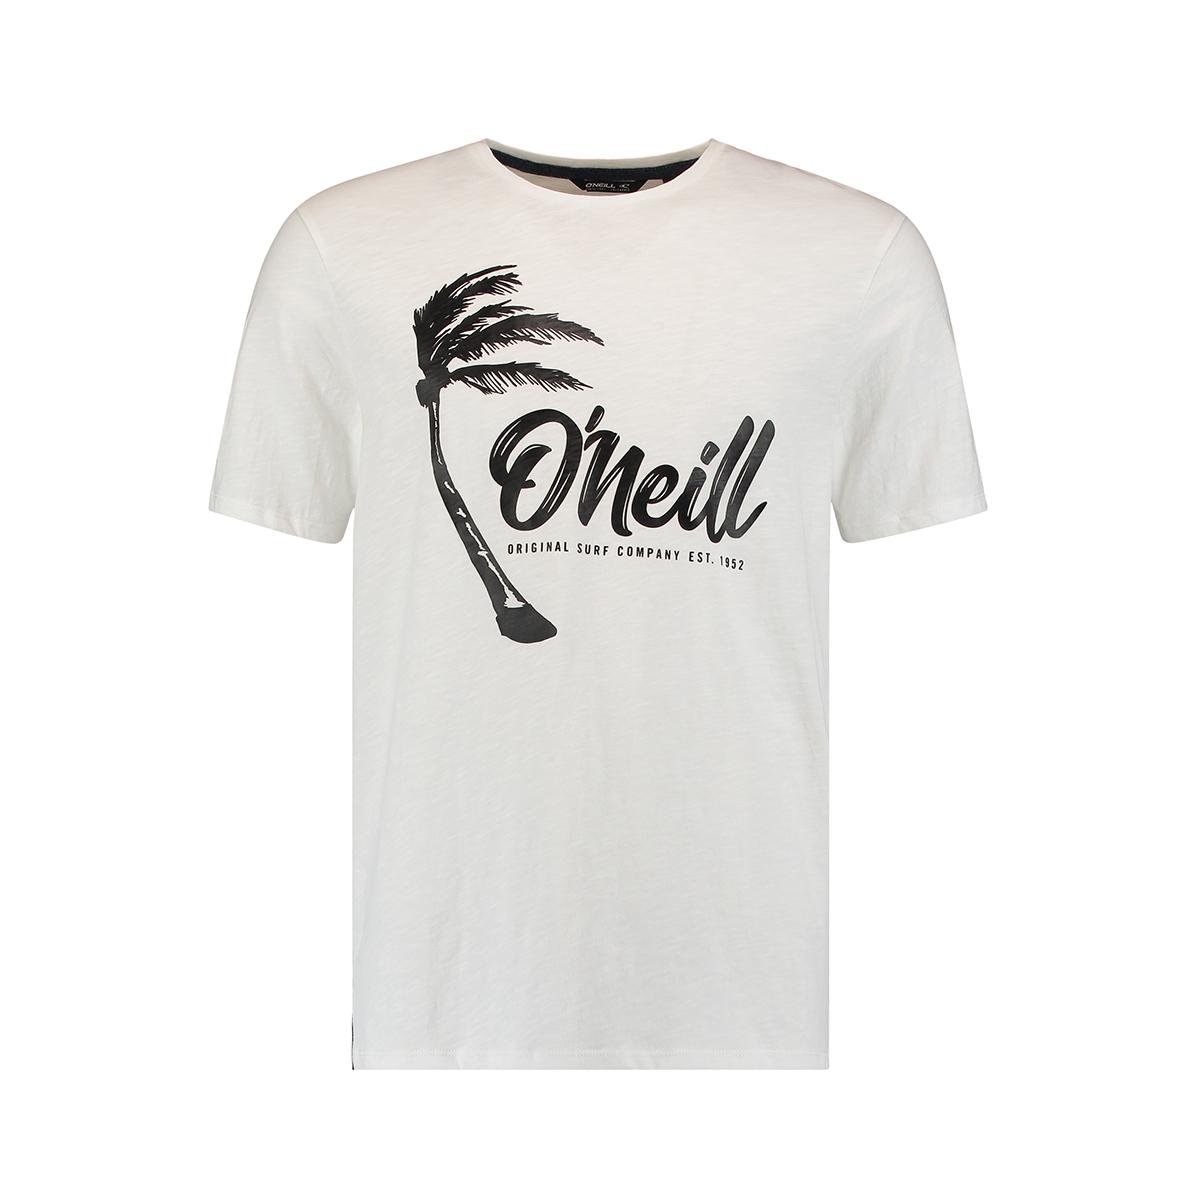 lm palm graphic t shirt 0a2352 o`neill t-shirt 1030 powder white